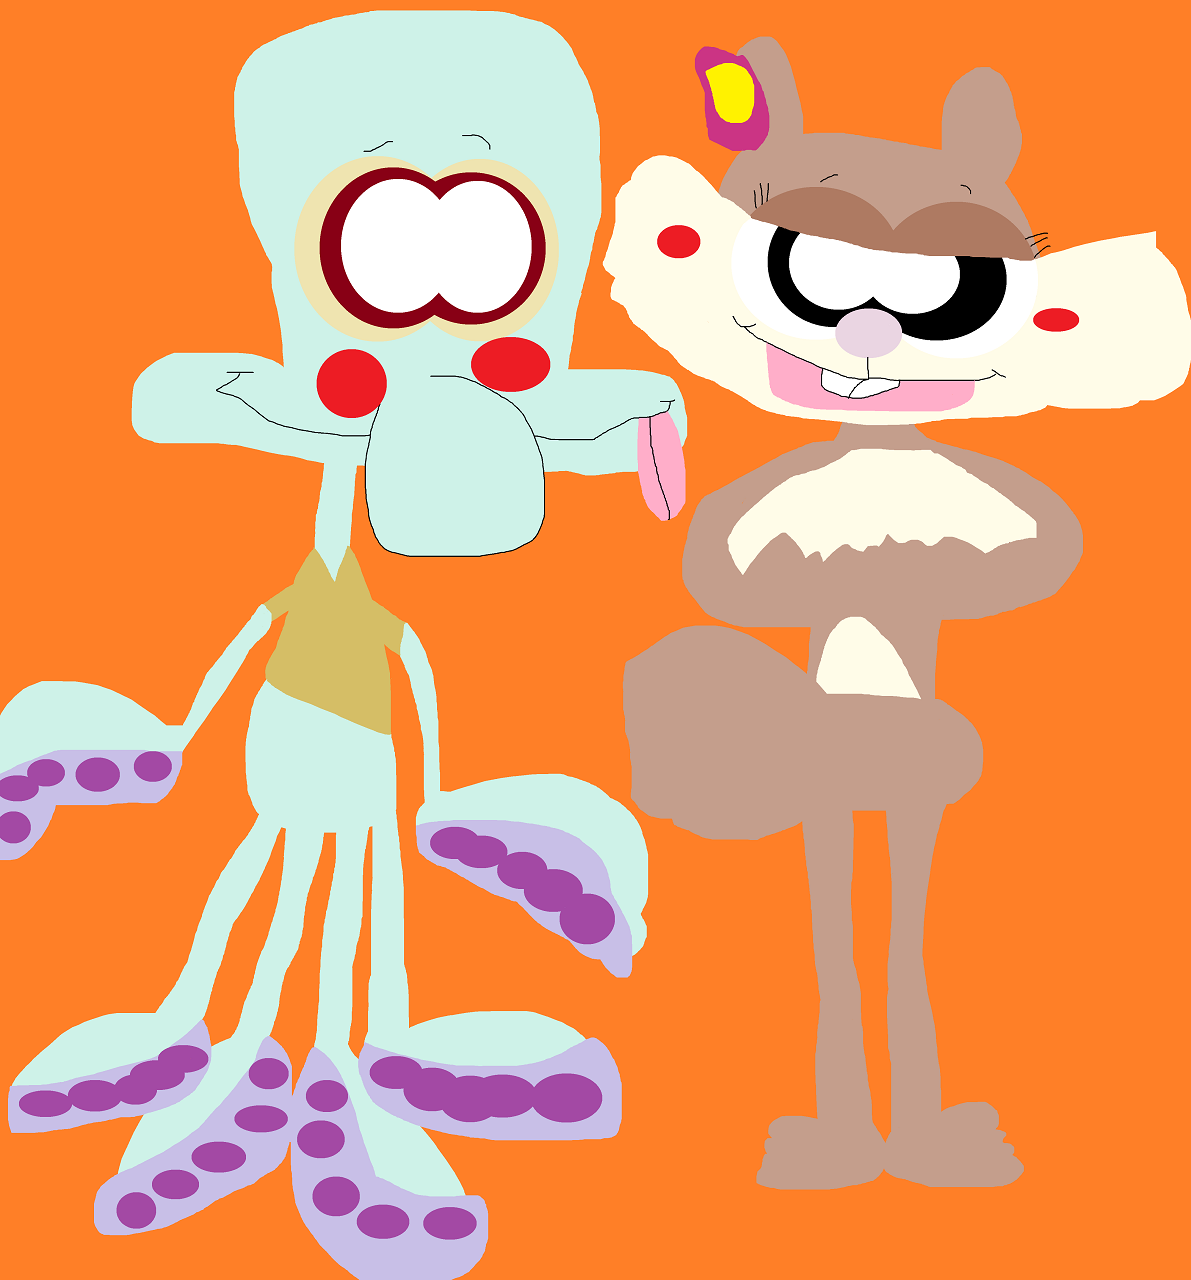 Just Sandy Enticing Squidward Again by Falconlobo